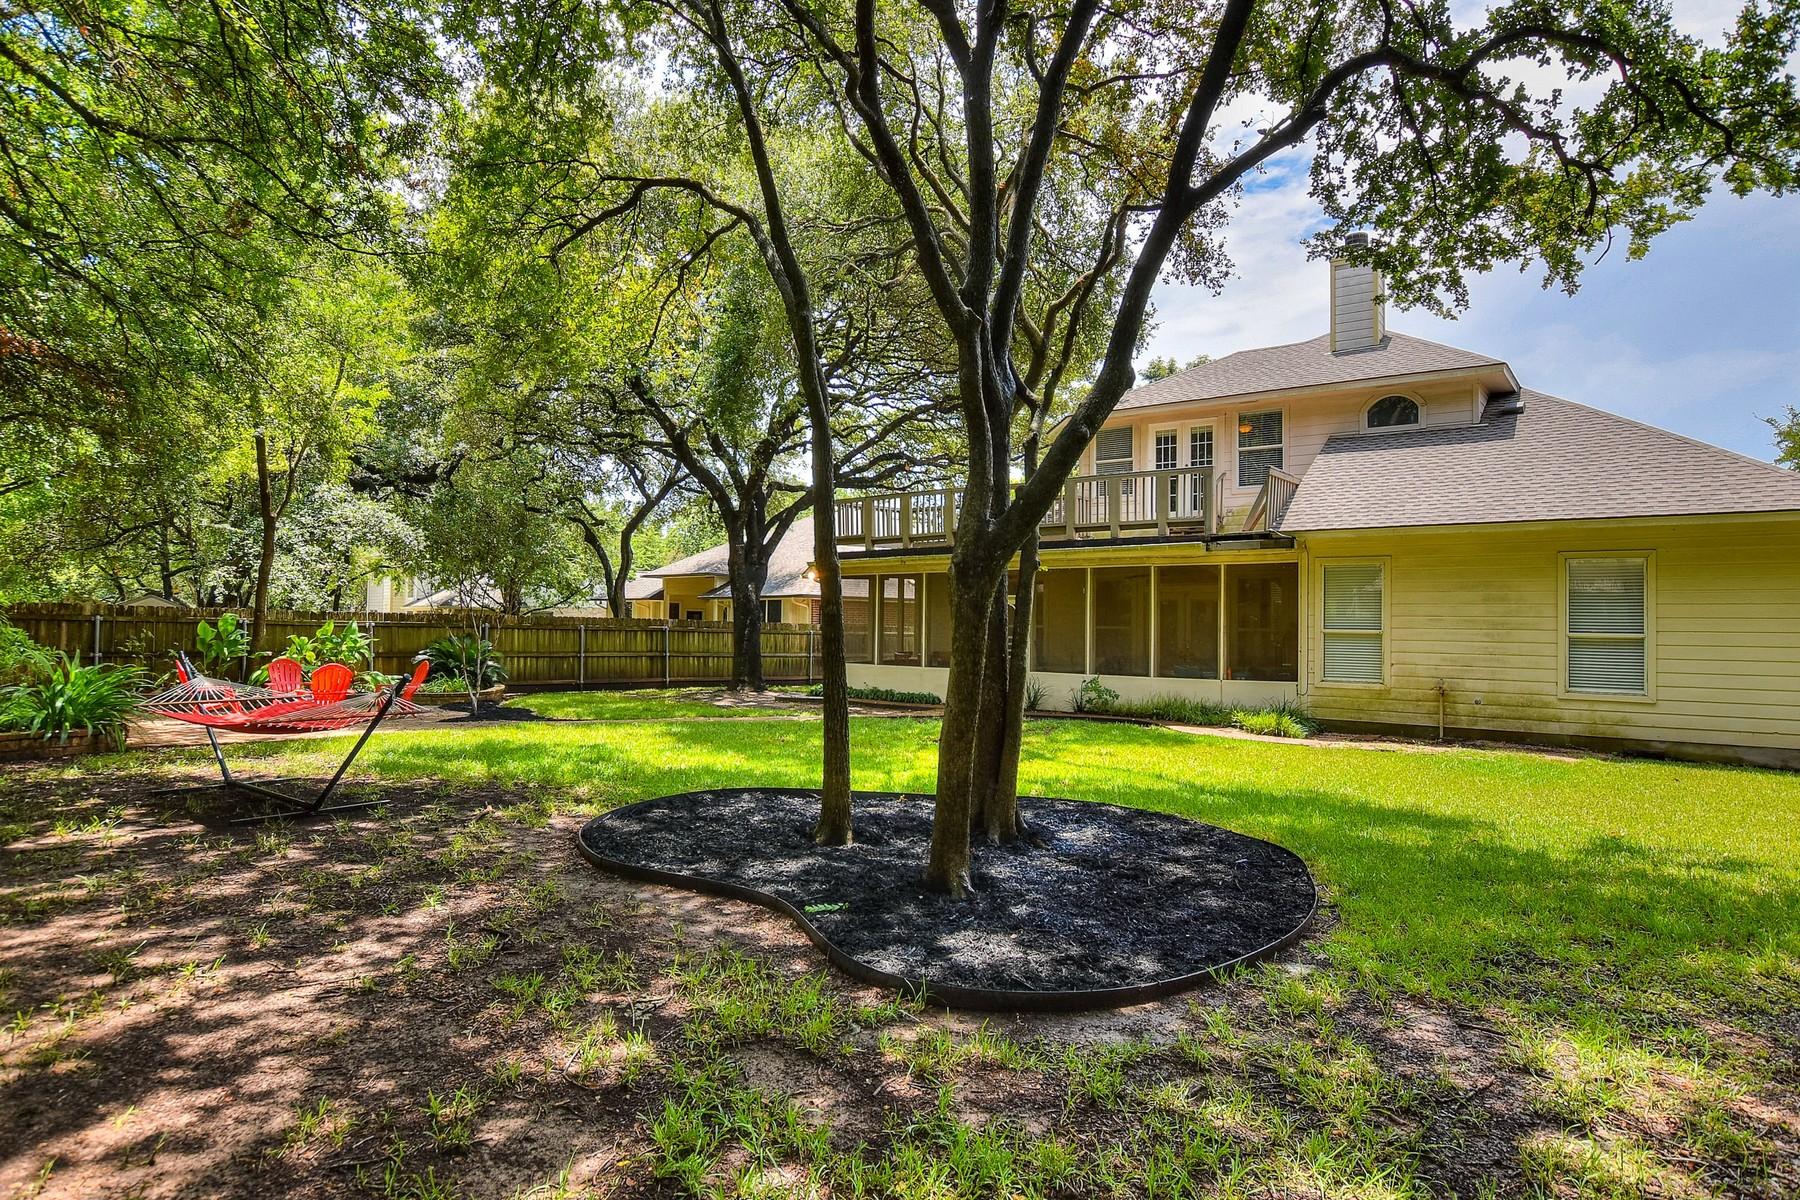 Additional photo for property listing at This Home has it All! 2716 Arroyo Blanco Cv Austin, Texas 78748 Estados Unidos